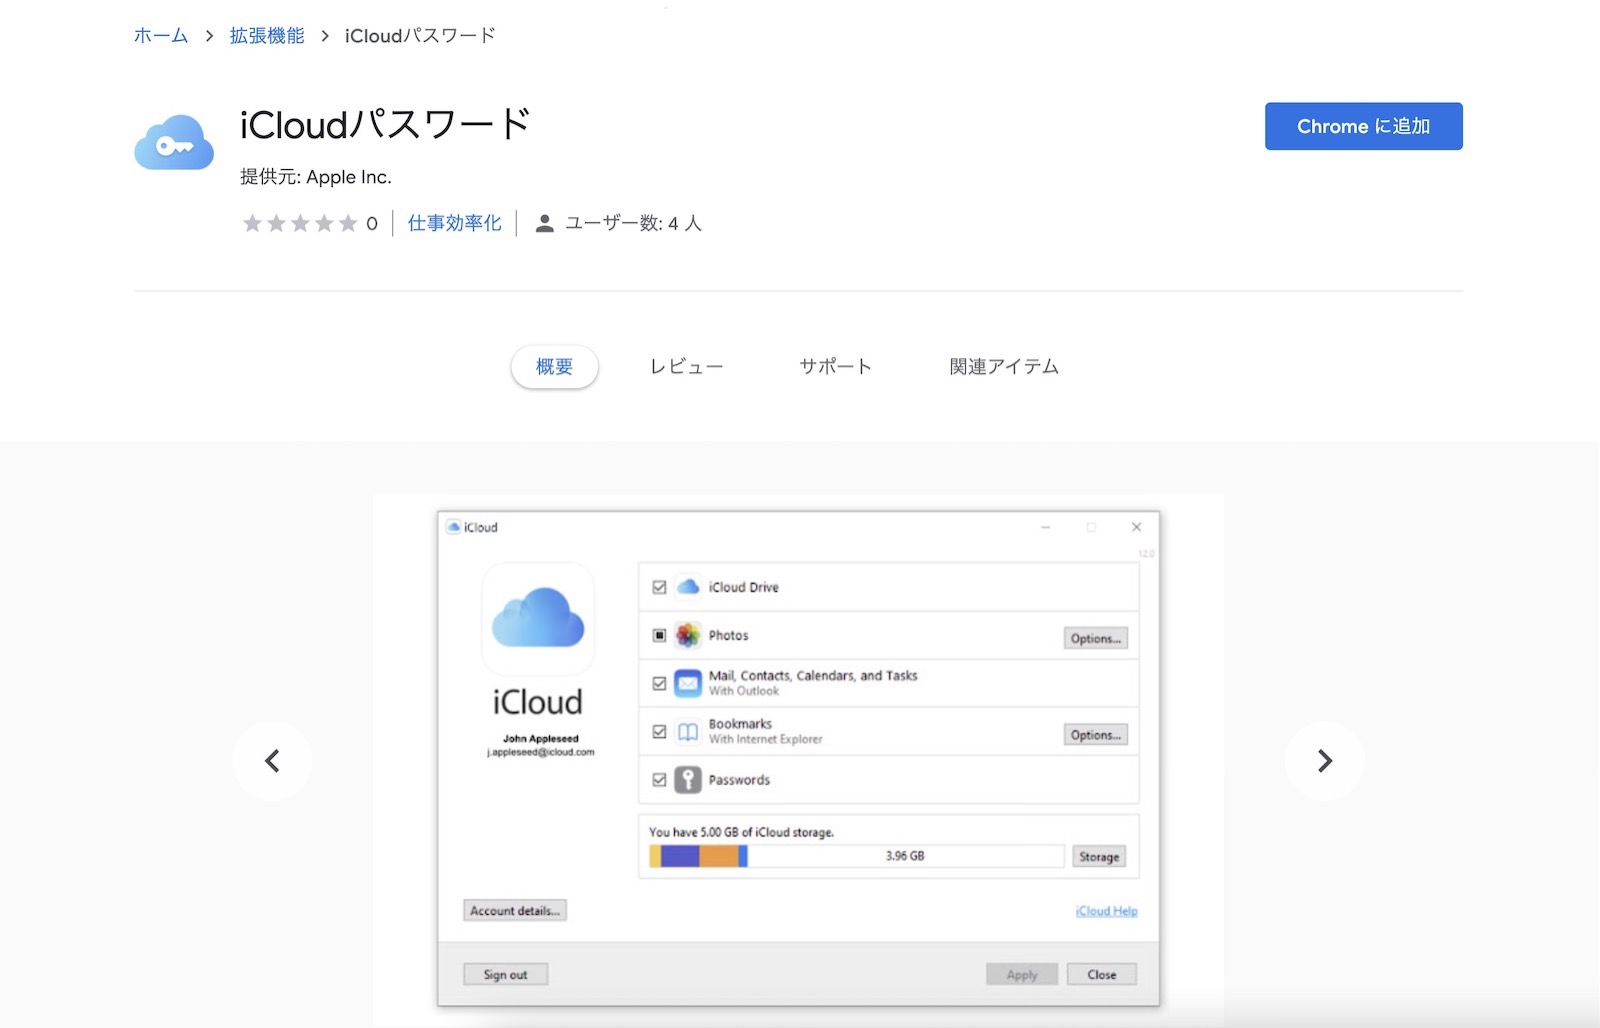 Icloud passowrds for google chrome